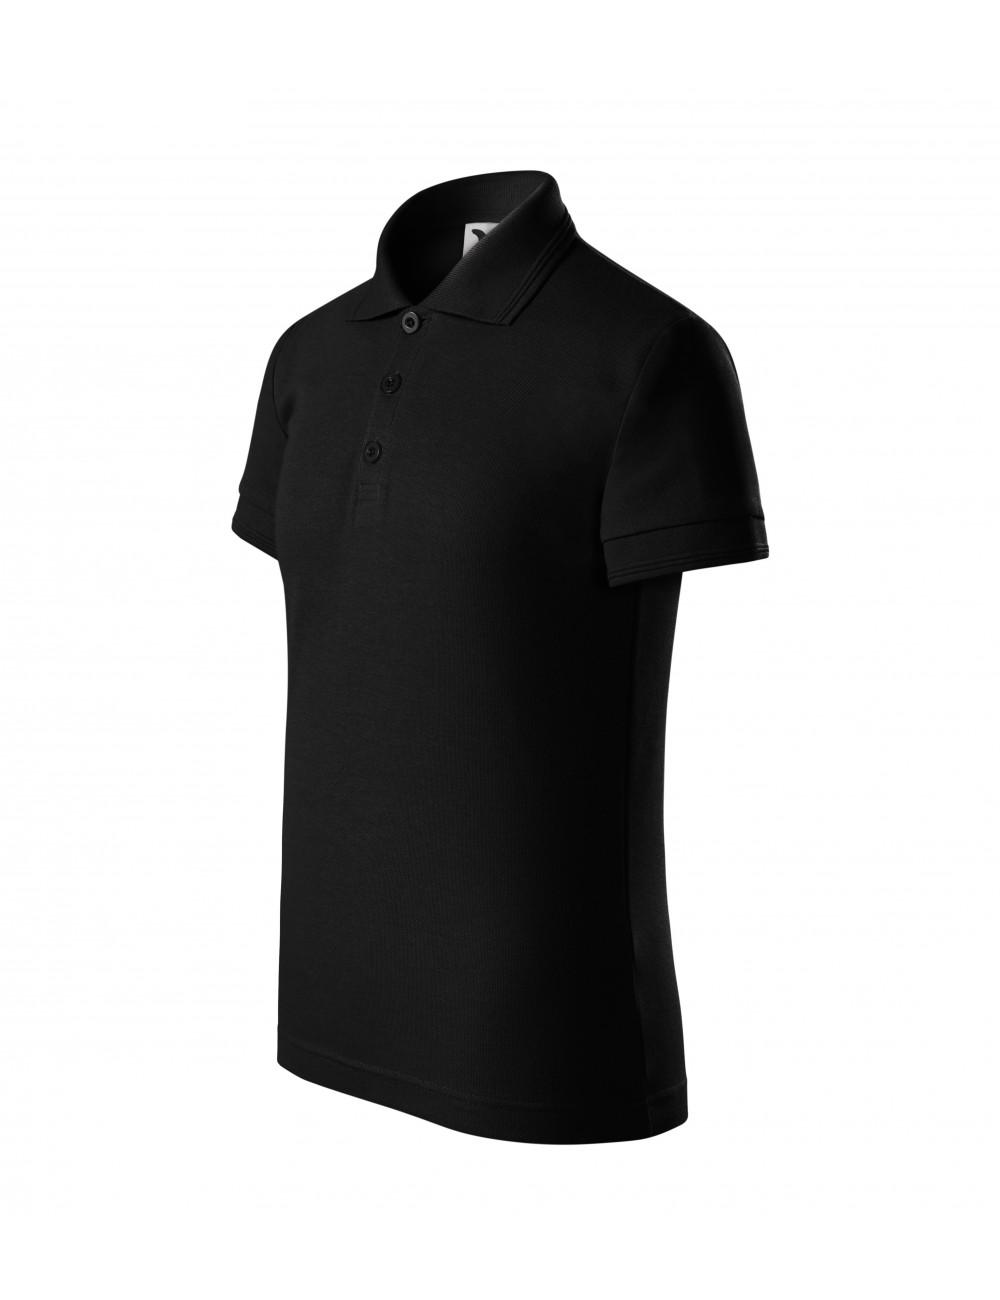 Adler MALFINI Koszulka polo dziecięca Pique Polo 222 czarny